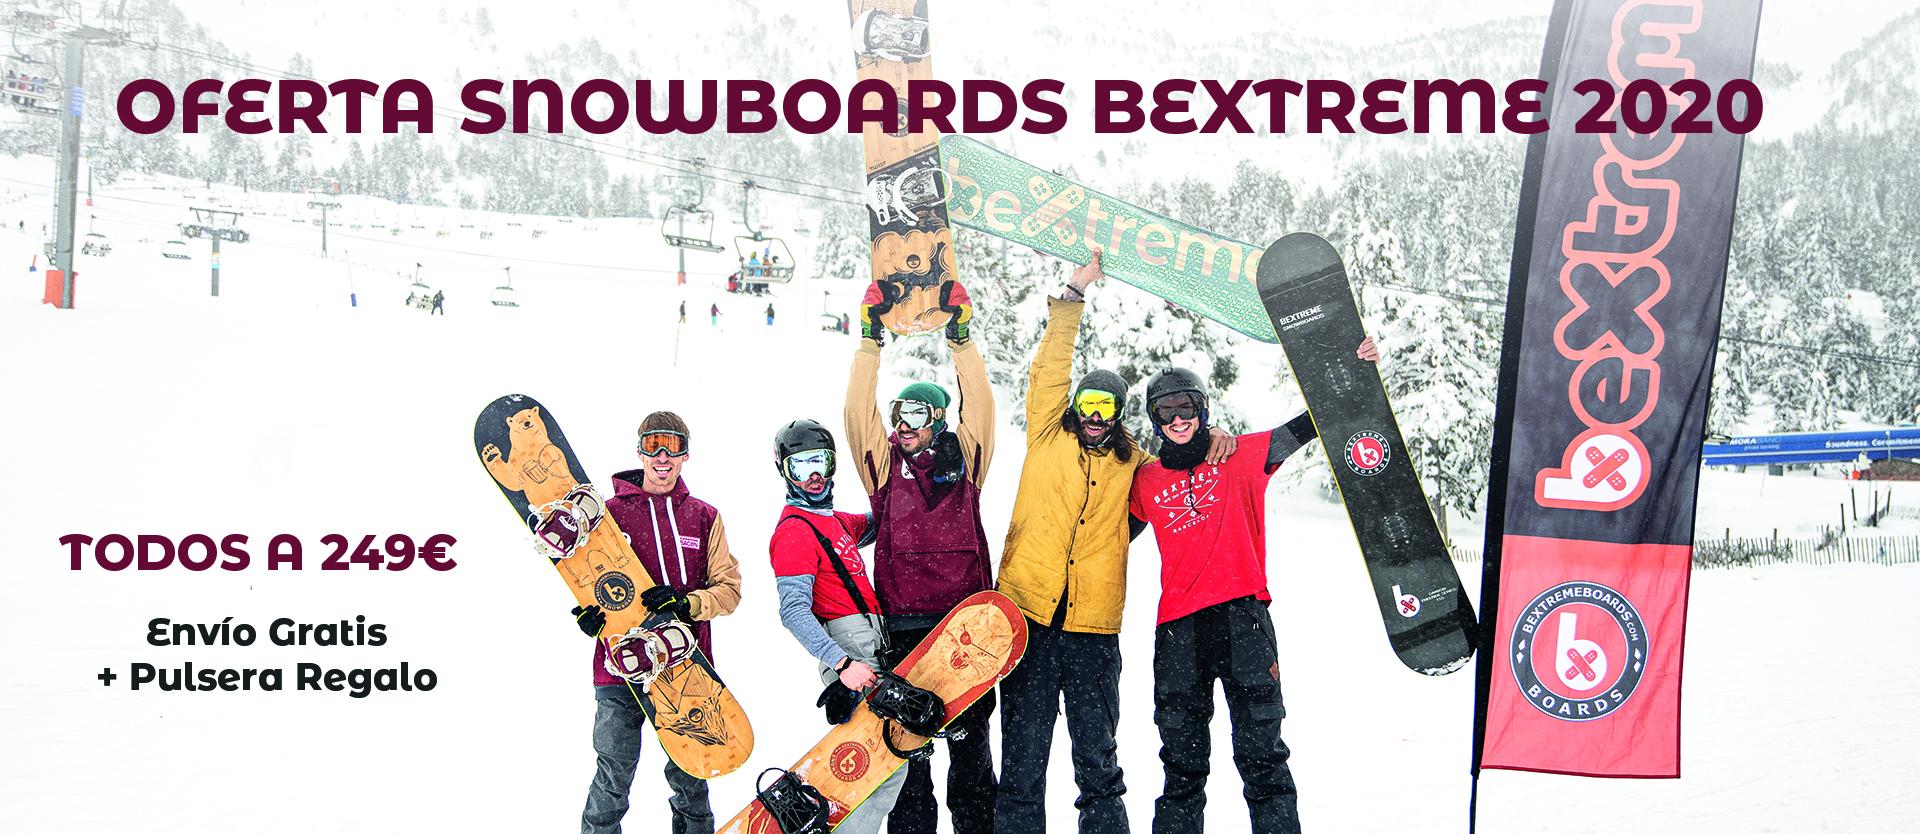 oferta snowboards 2020